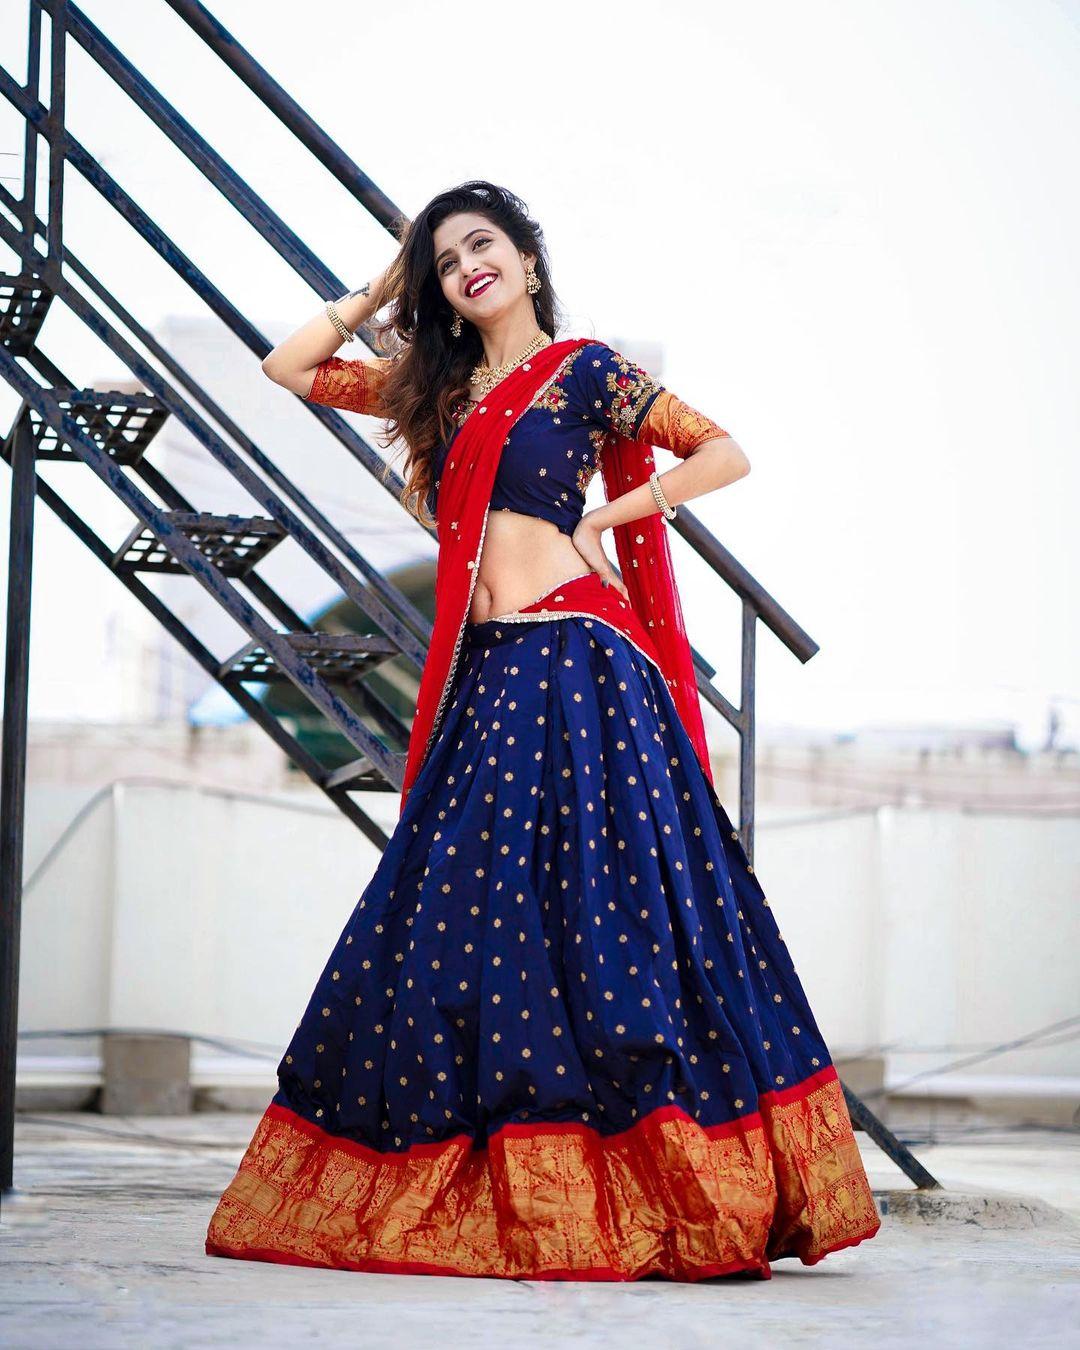 Deepika Pilli : సోషల్ మీడియా స్టార్ దీపికా పిల్లి బ్యూటీఫుల్ పిక్స్.. Photo : Instagram